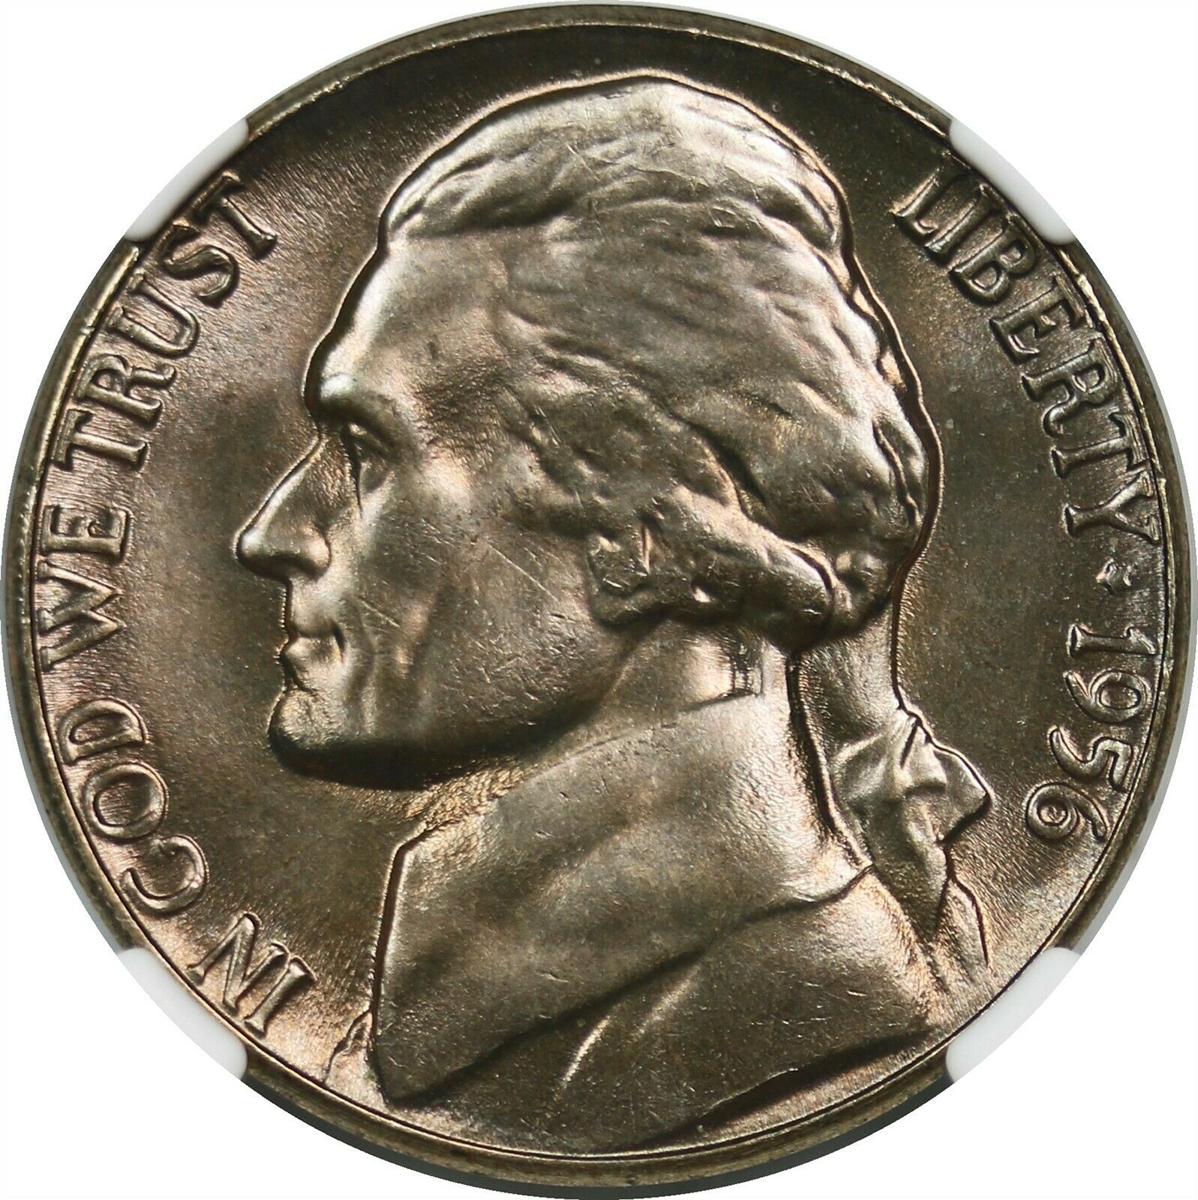 1956 5C Jefferson Nickel